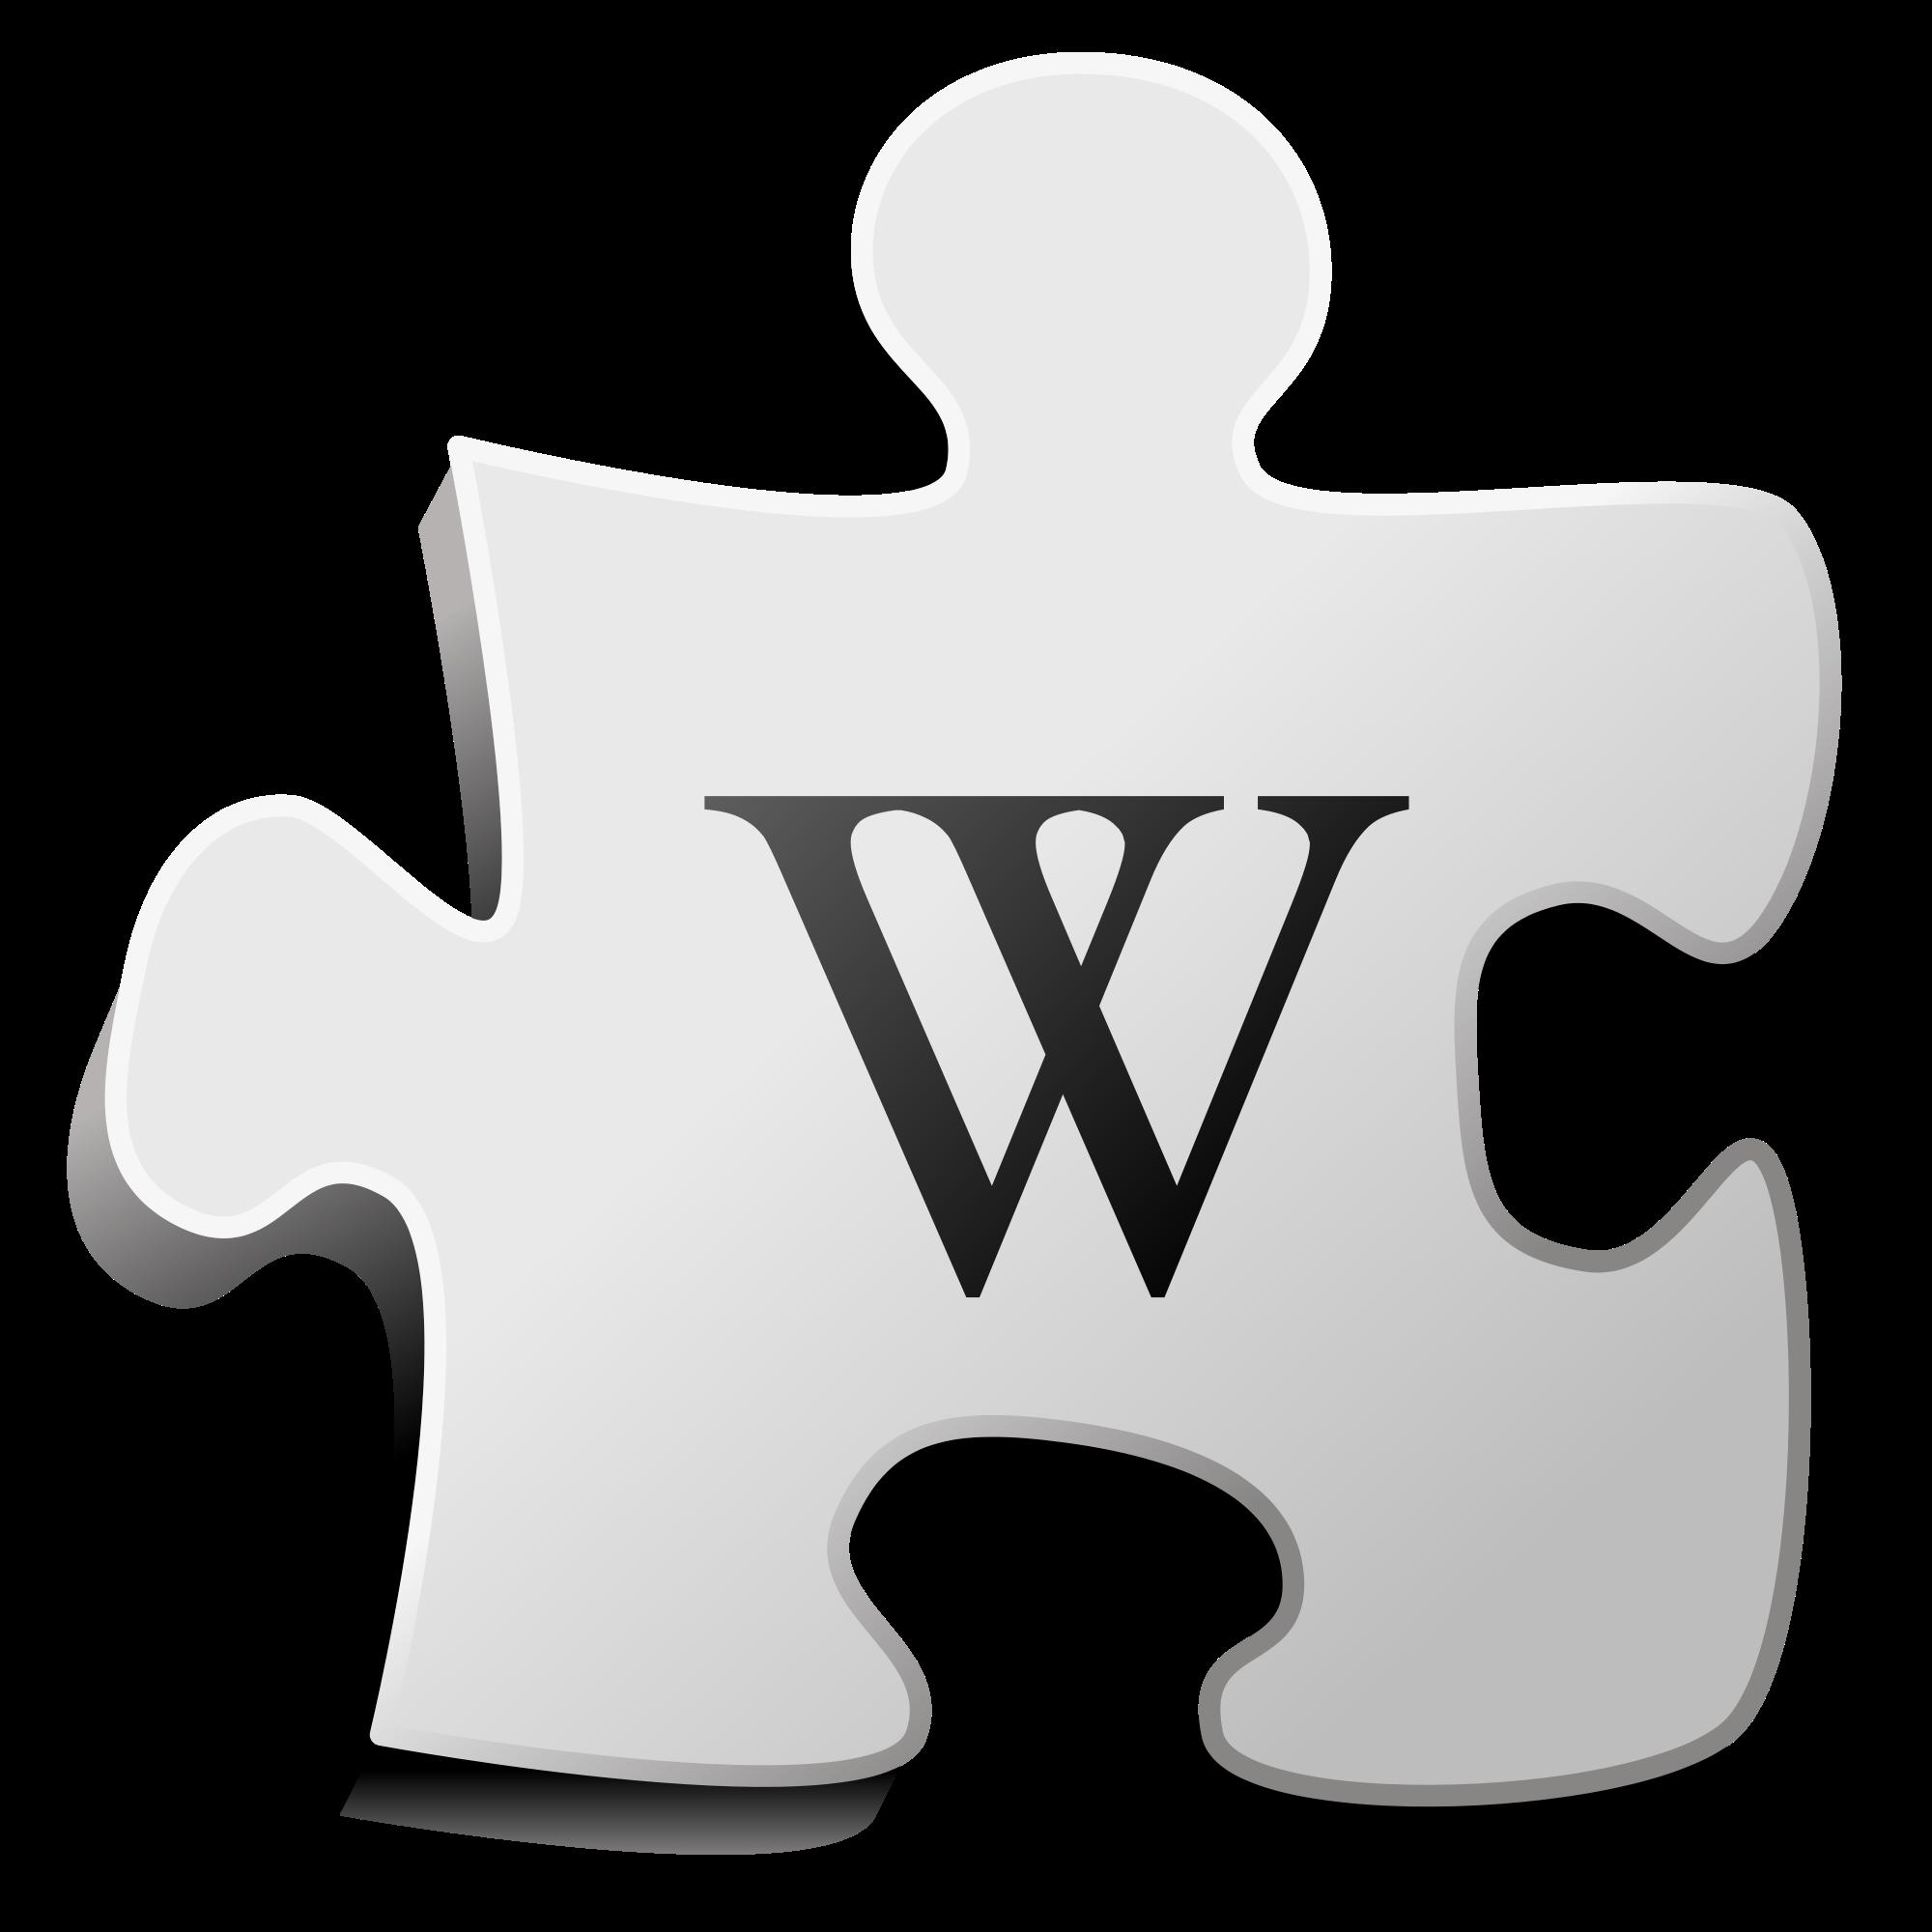 Puzzle clipart 6 piece. File wiki svg wikimedia